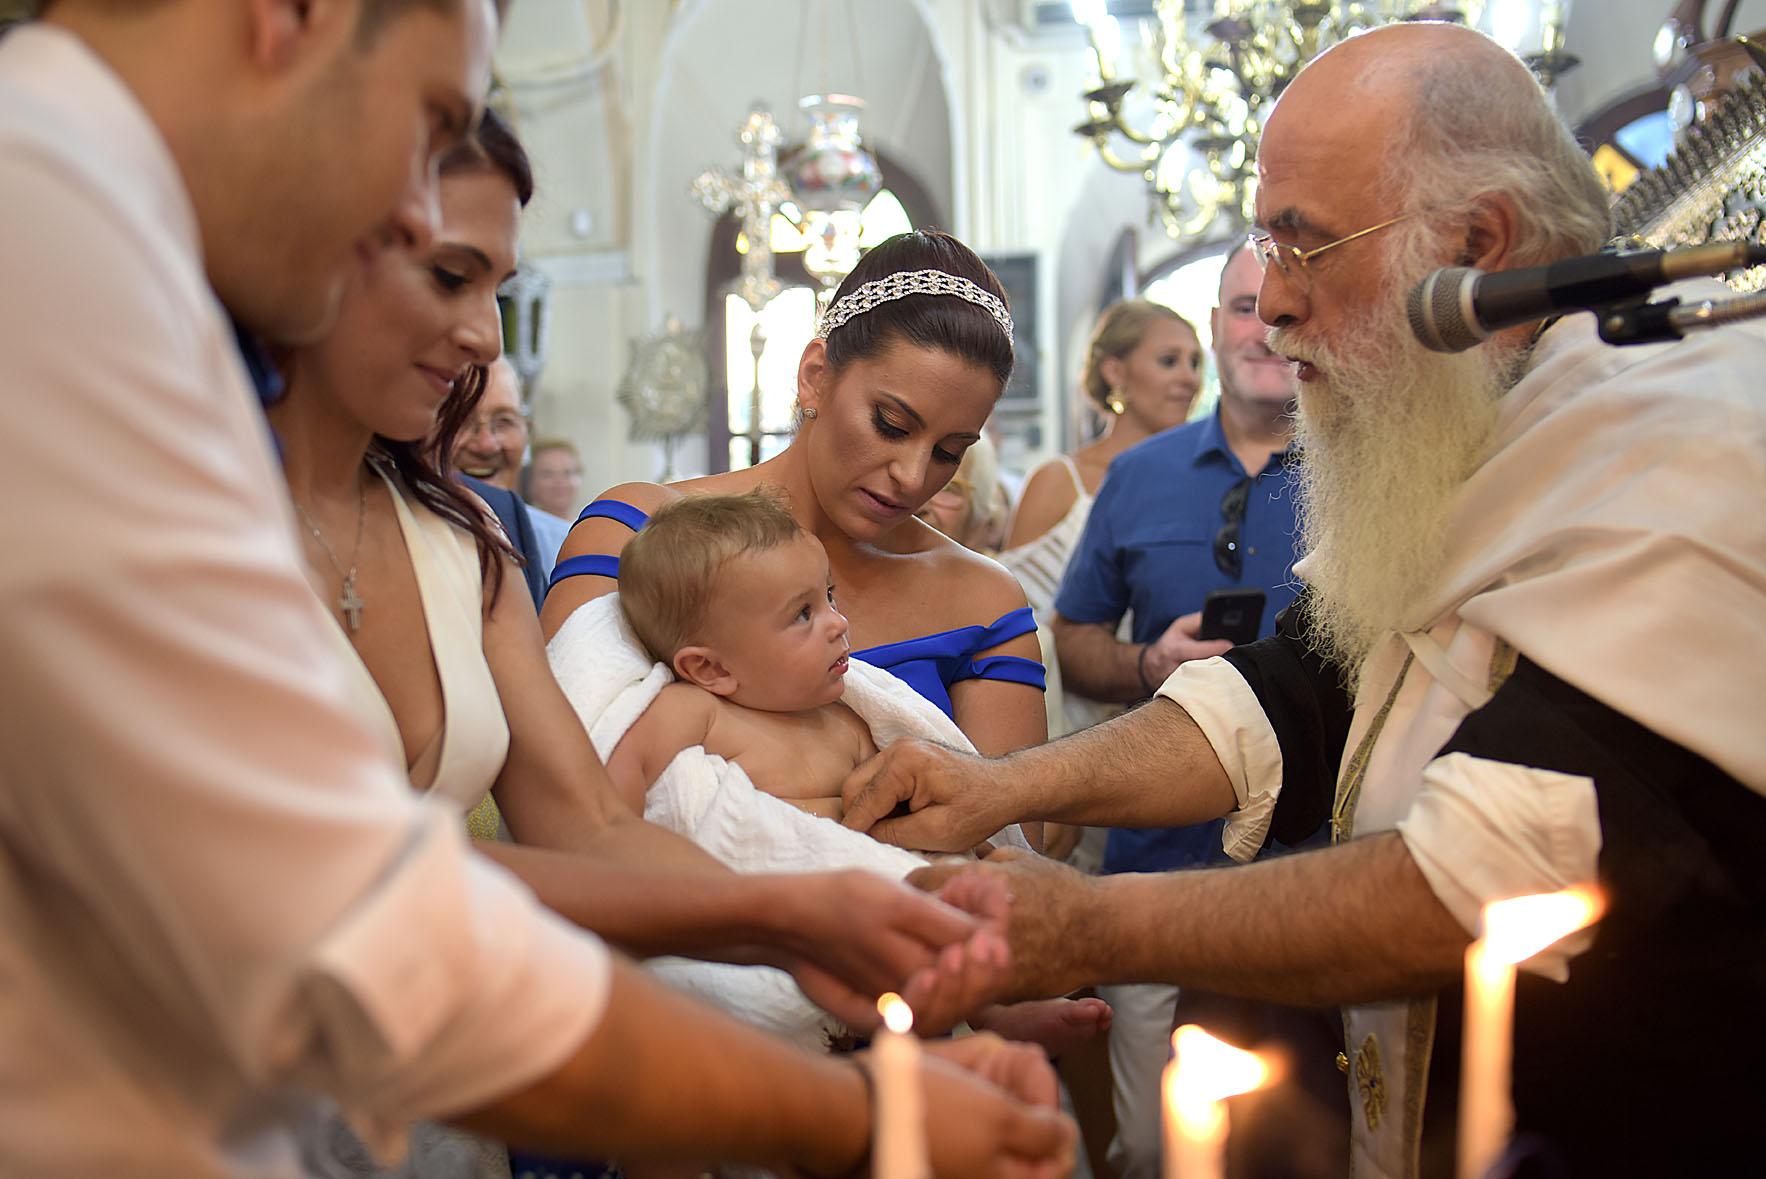 panagia-siriotissa-kampos-chios-christening-baptism-alexis-koumaditis-photography-13